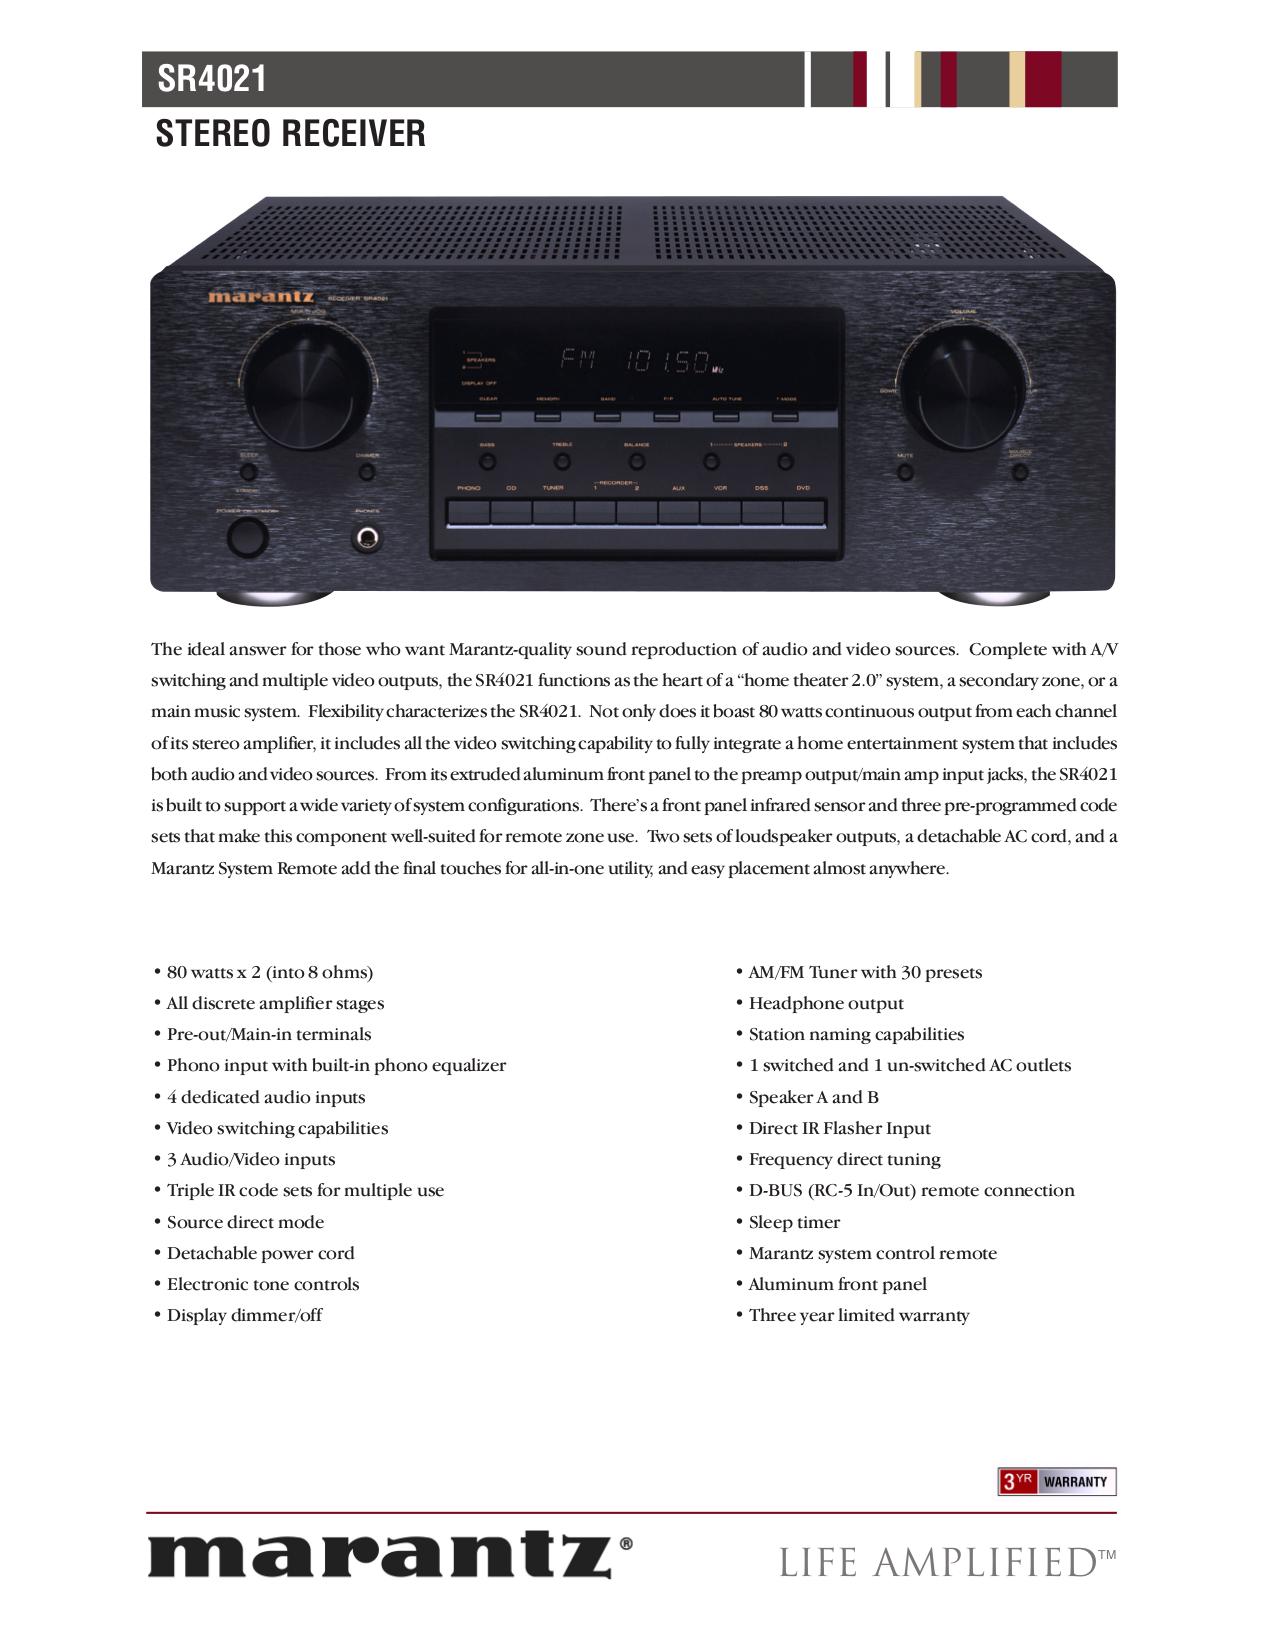 Marantz sr5001 manual ebook pdf for marantz receiver sr4021 manual fandeluxe Choice Image